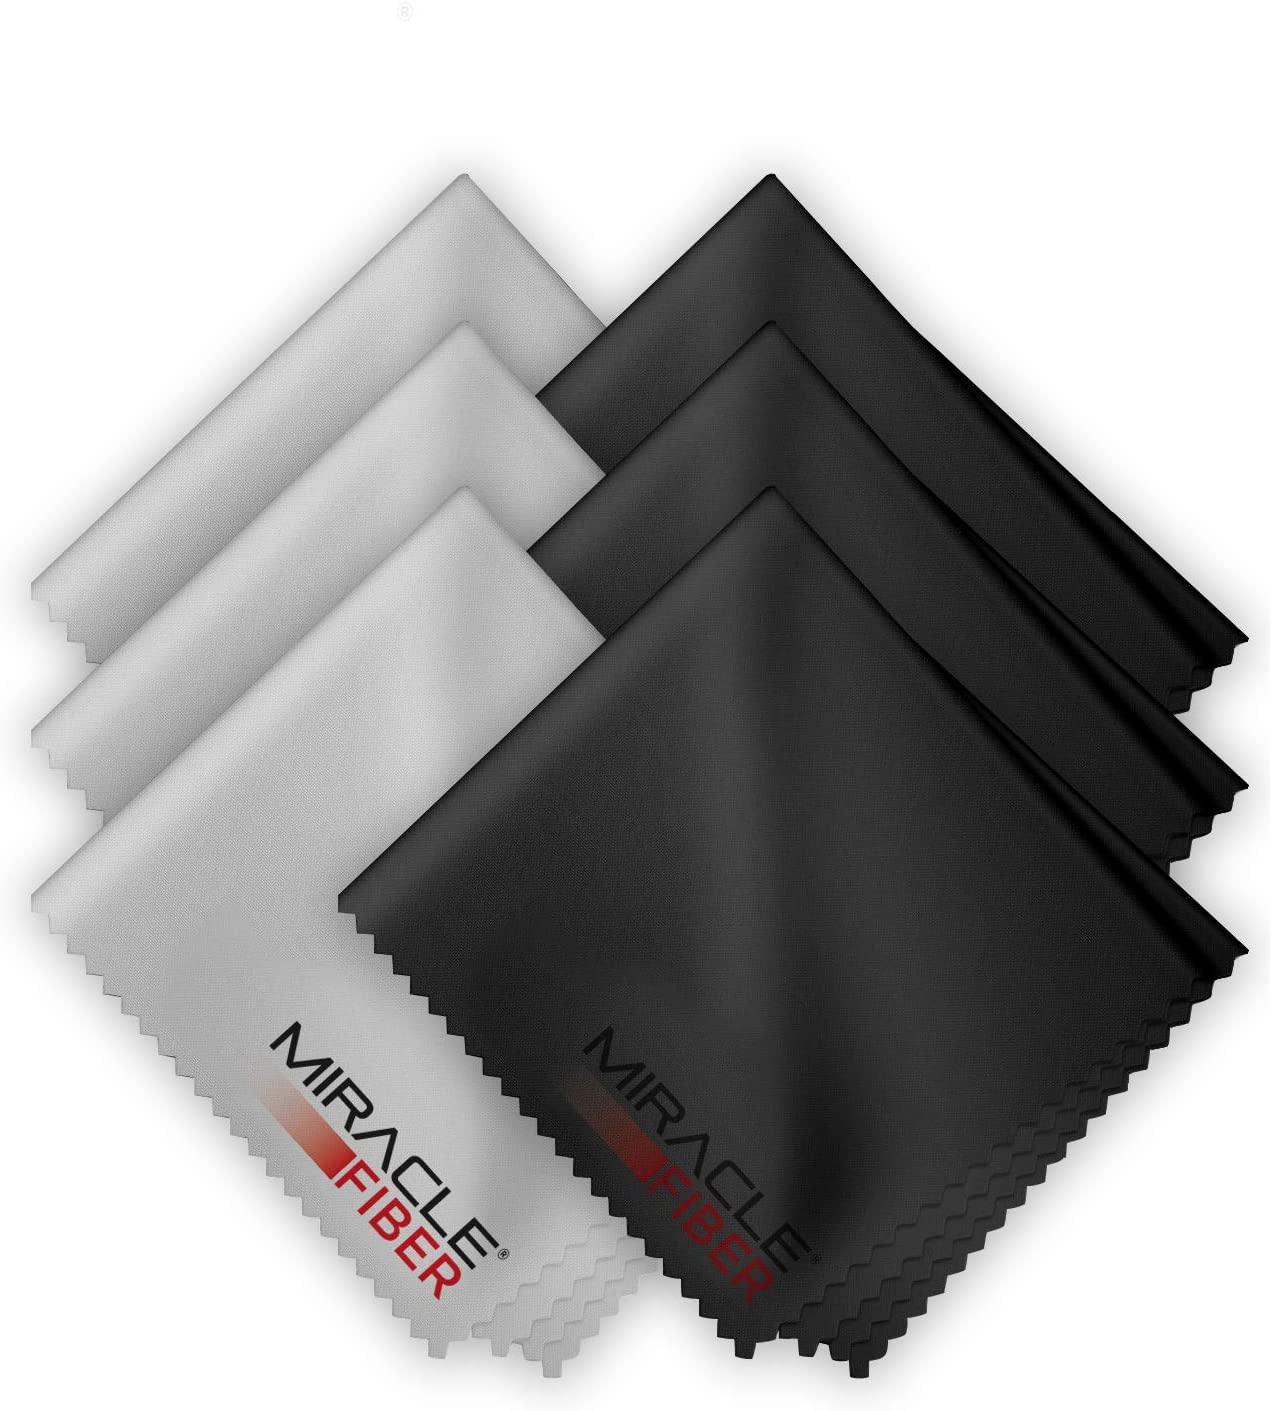 Miracle Fiber Microfiber Cleaning Cloths (6 Pack), Black/Grey